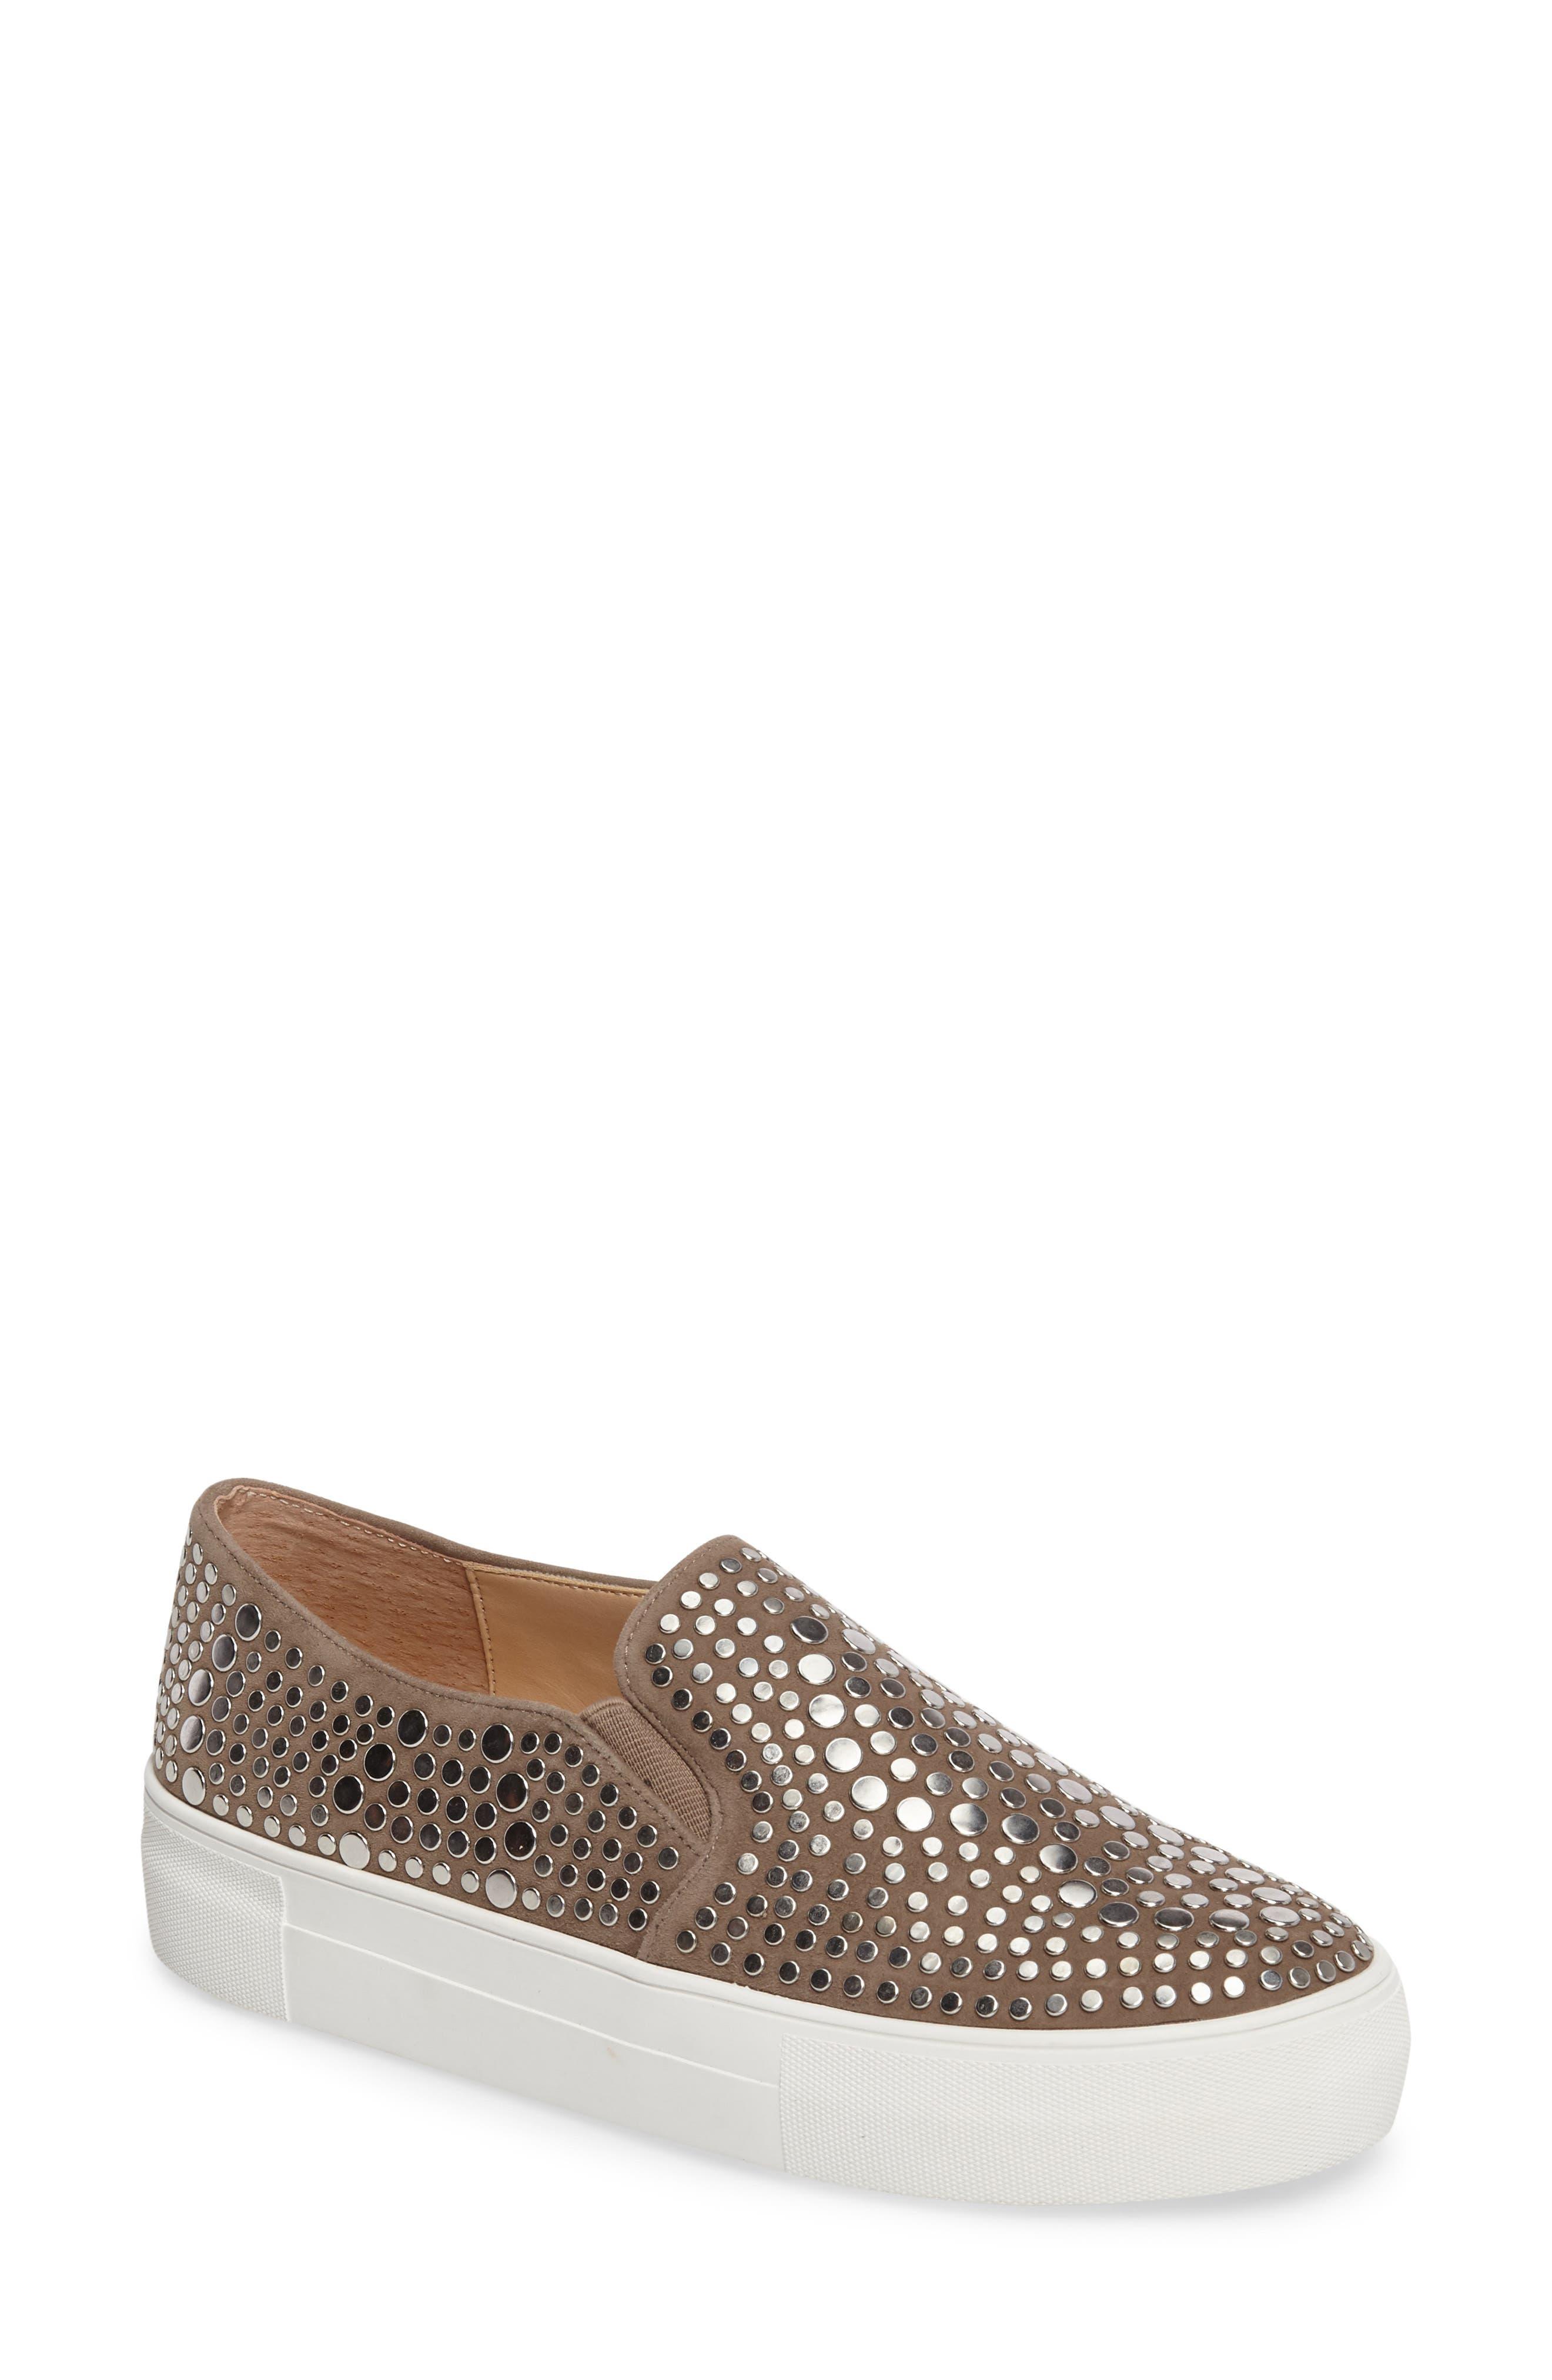 Vince Camuto Kindra Stud Slip-On Sneaker (Women)